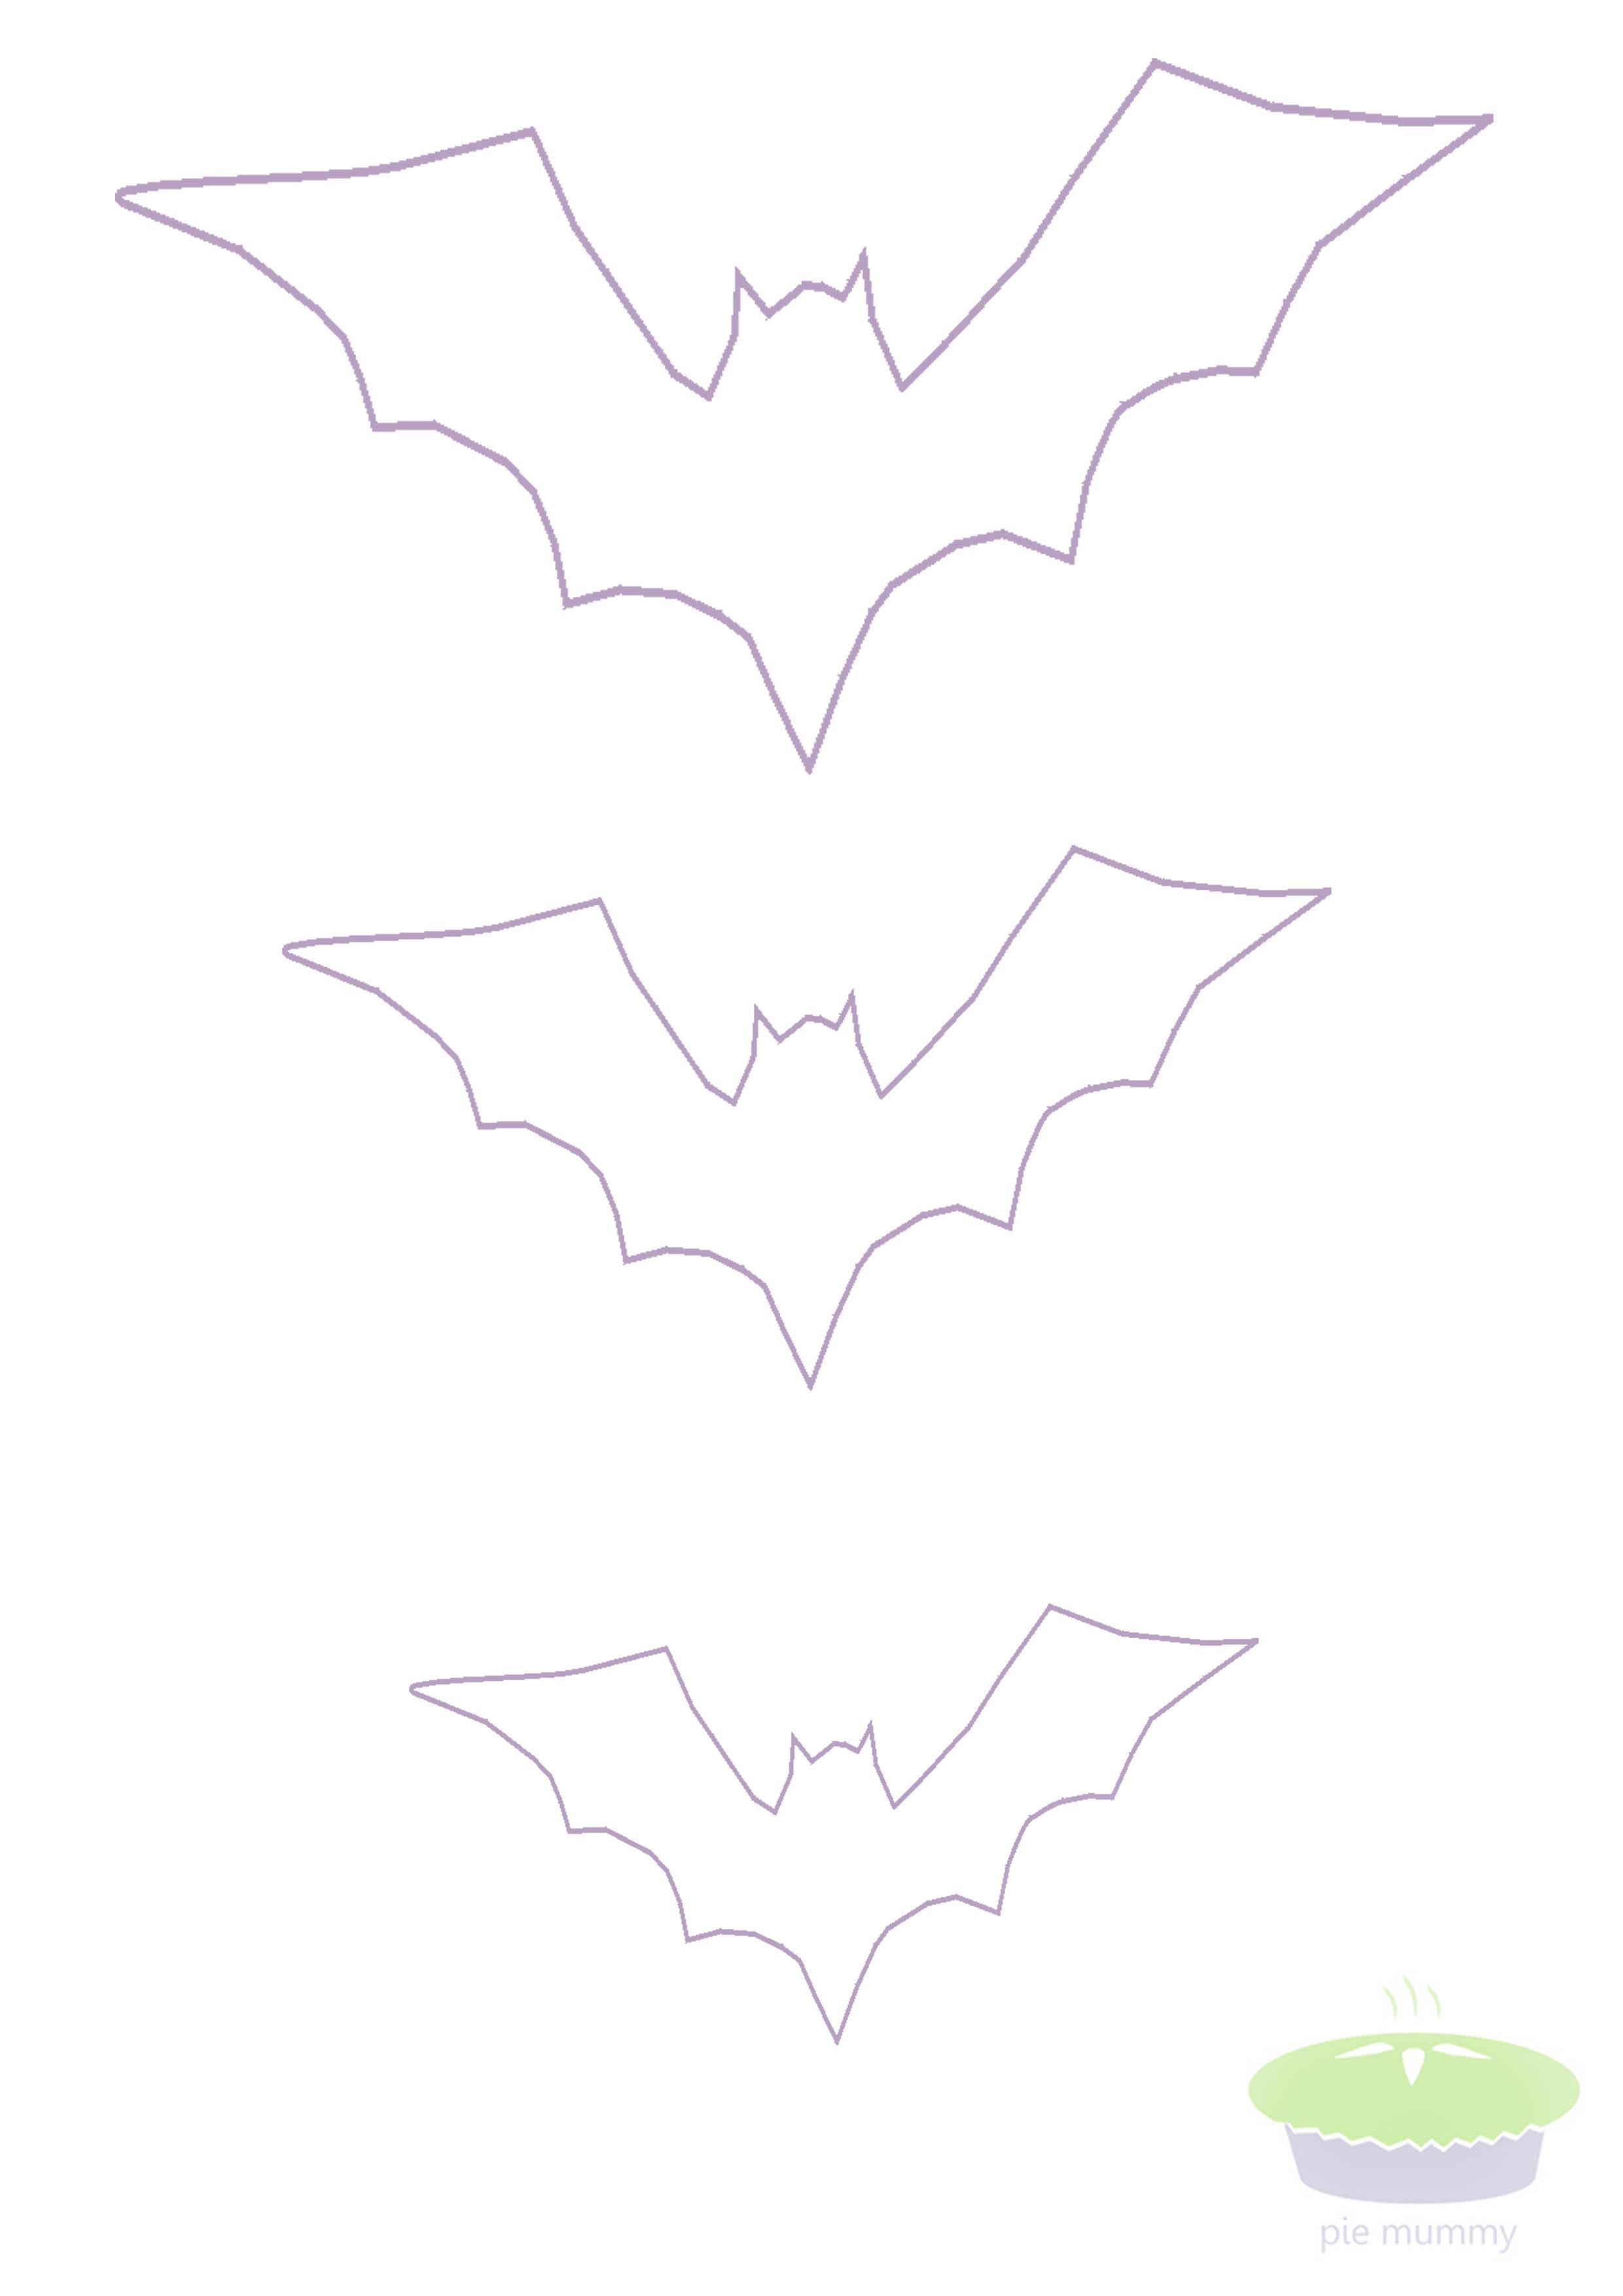 Pleasing Bat Stencil Bat Decorations Homemade My Web Value Bat Cut Out Cookies Baseball Bat Cut Out baby Bat Cut Out